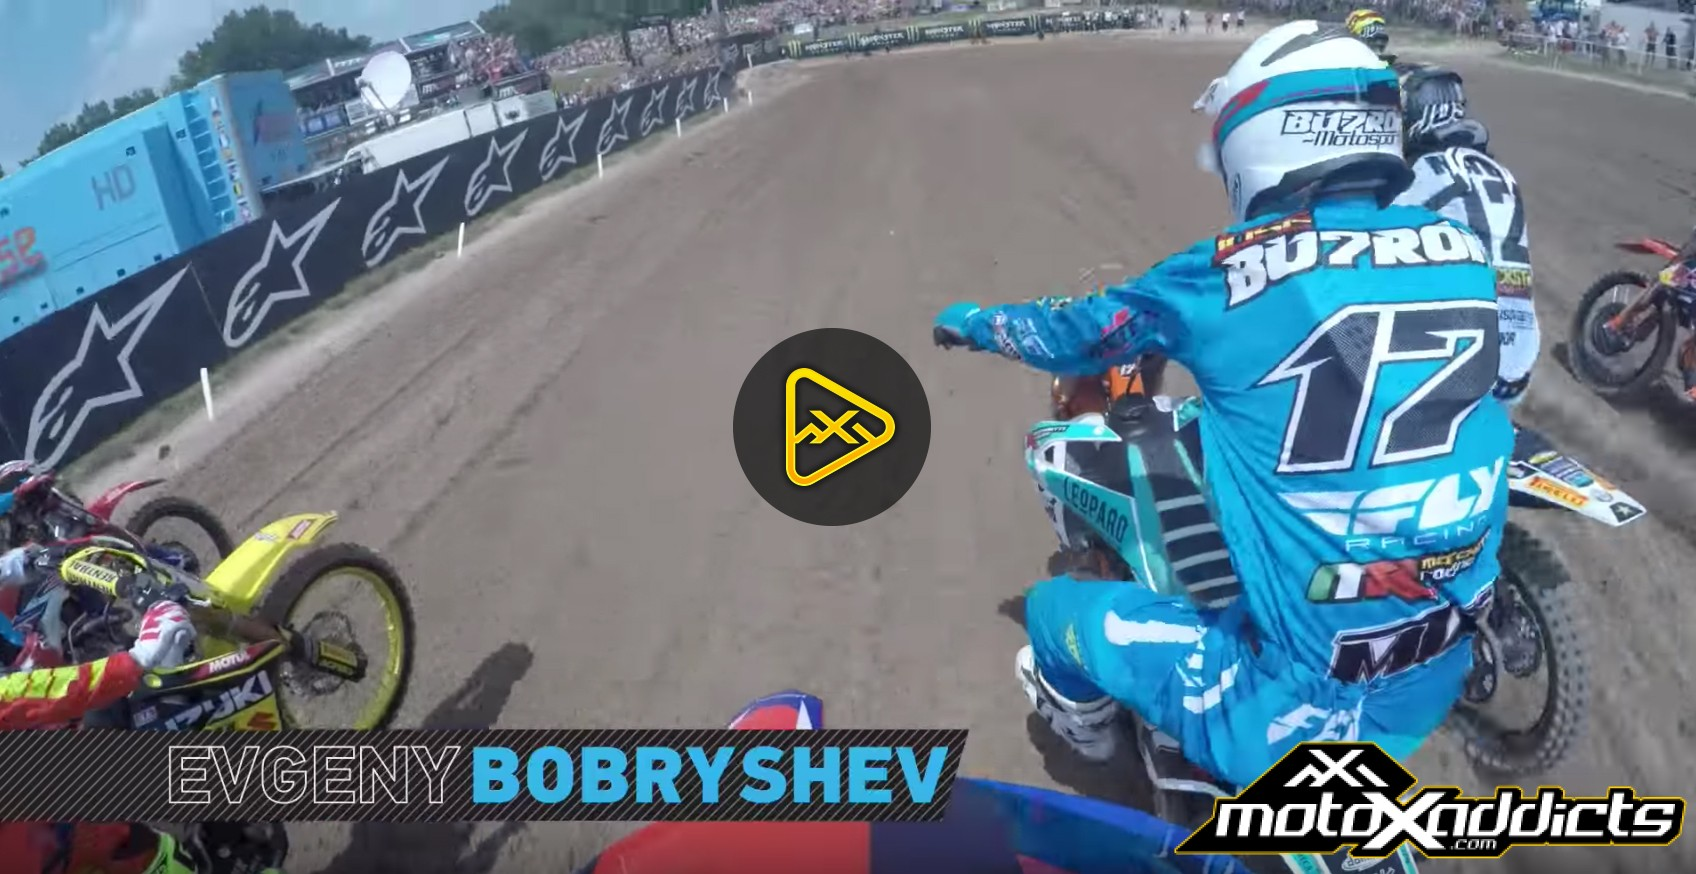 Helmet Cam: Evgeny Bobryshev at 2016 MXGP of Lombardia-Italy